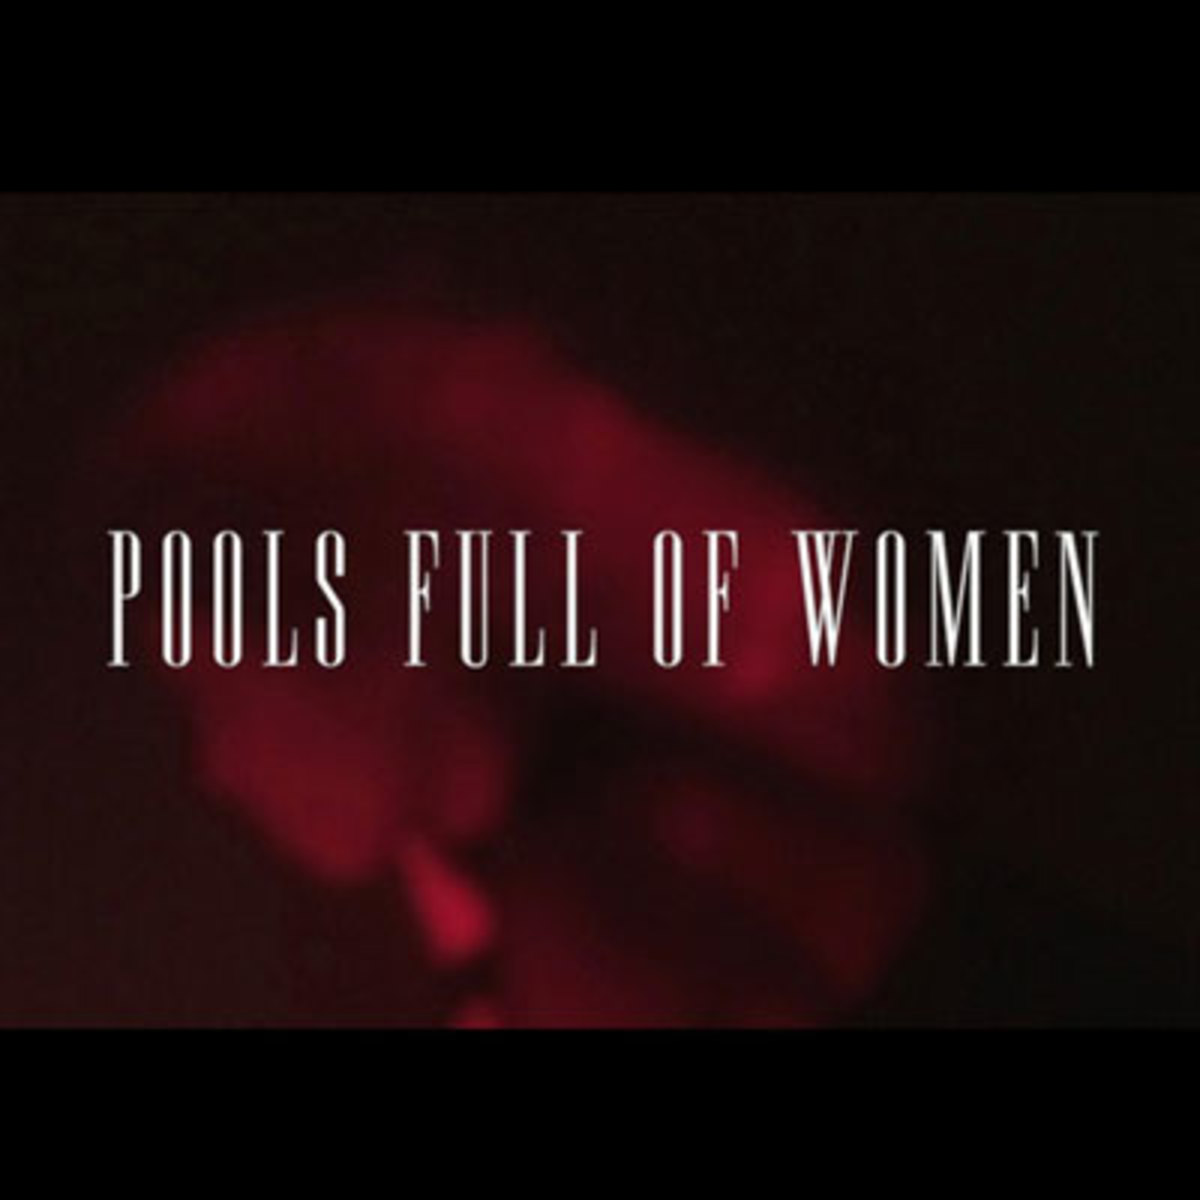 esty-poolsfullofwomen.jpg